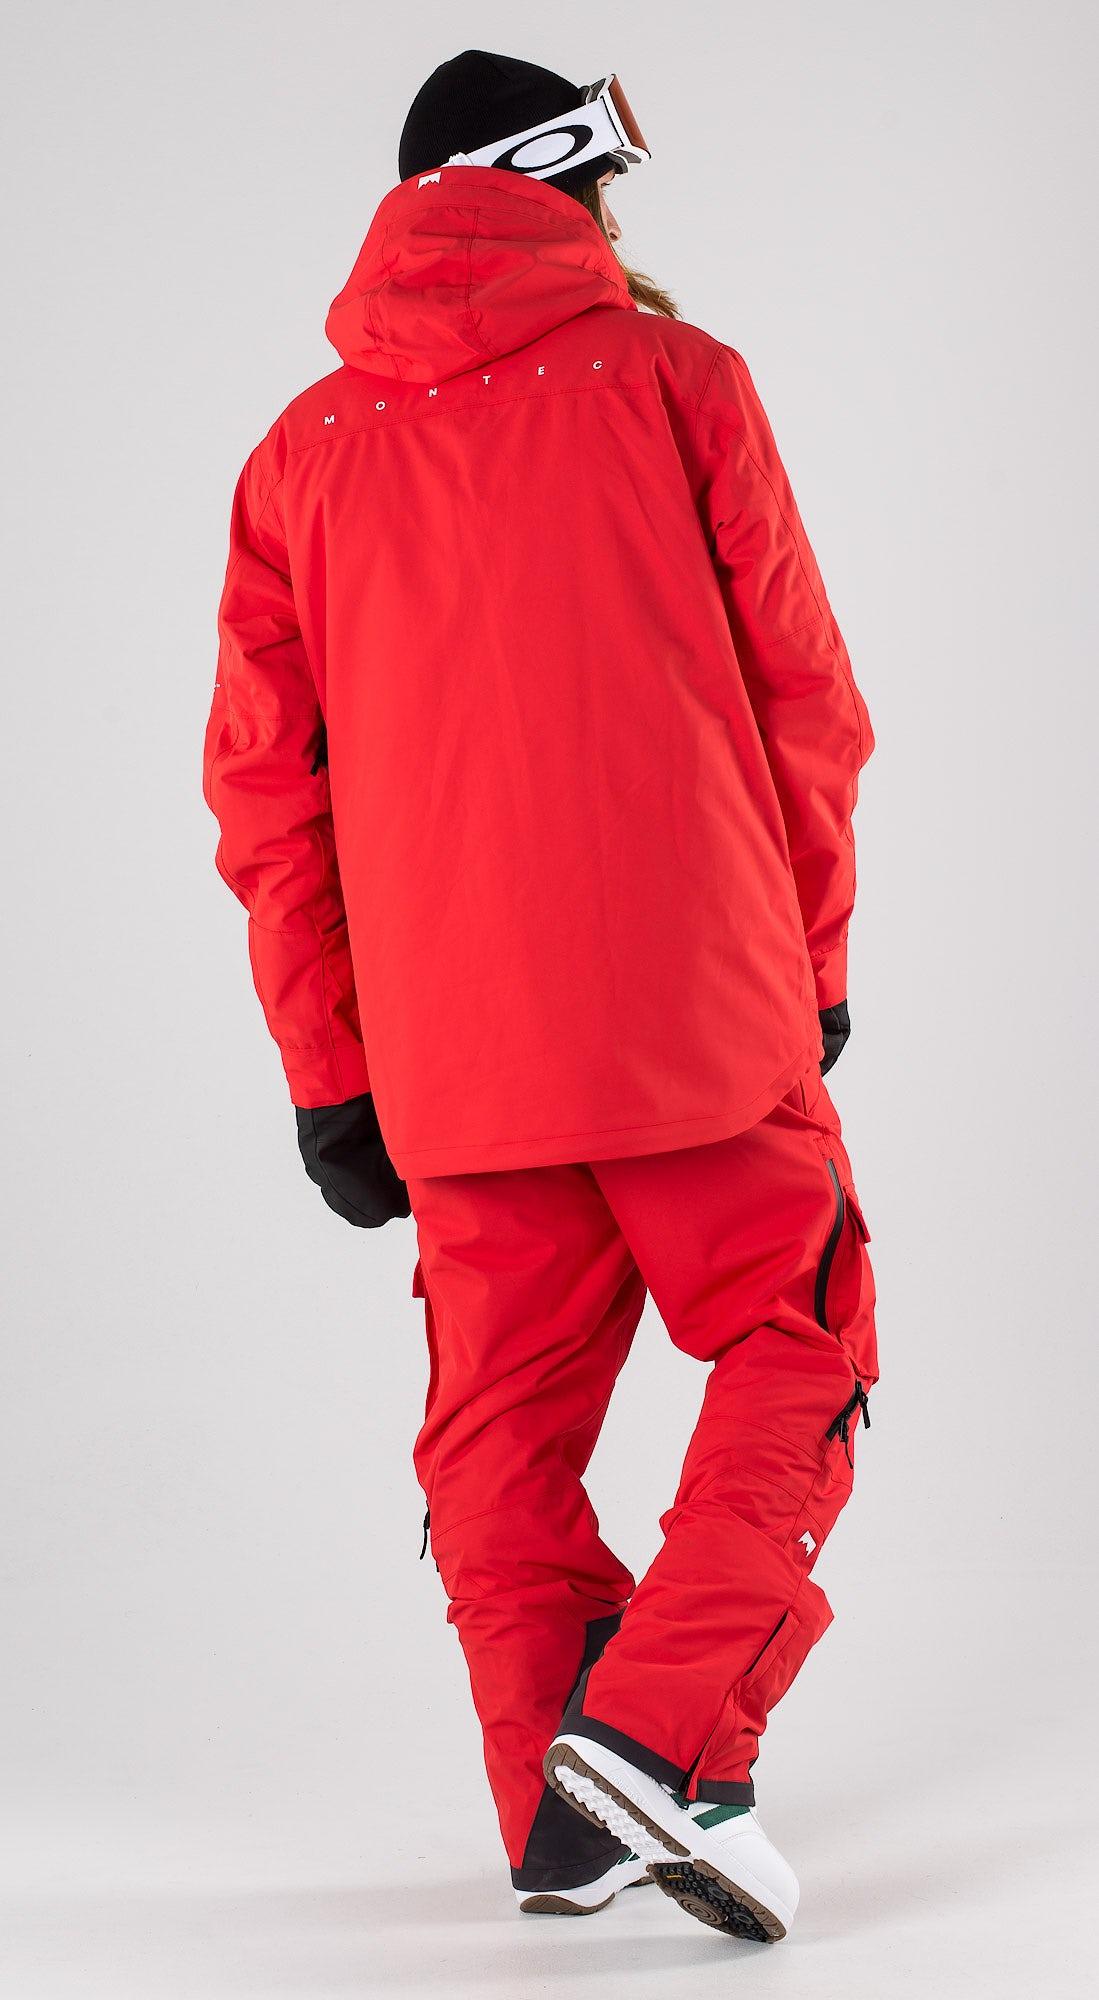 Montec Fawk Red